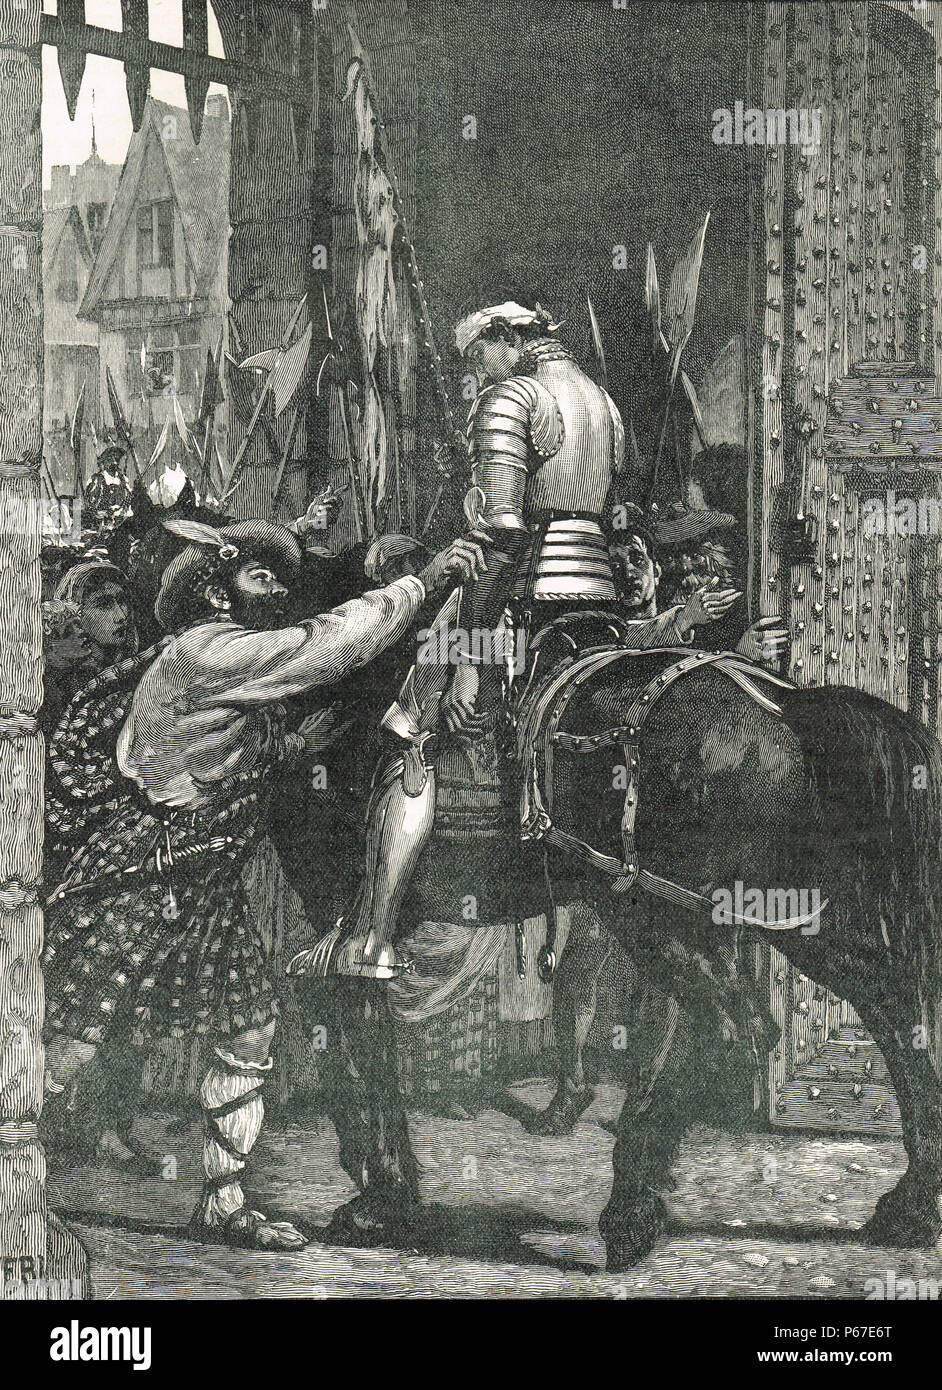 Randolph Murray, survivor of battle of Flodden 1513, returning to Edinburgh, bringing news of the defeat - Stock Image